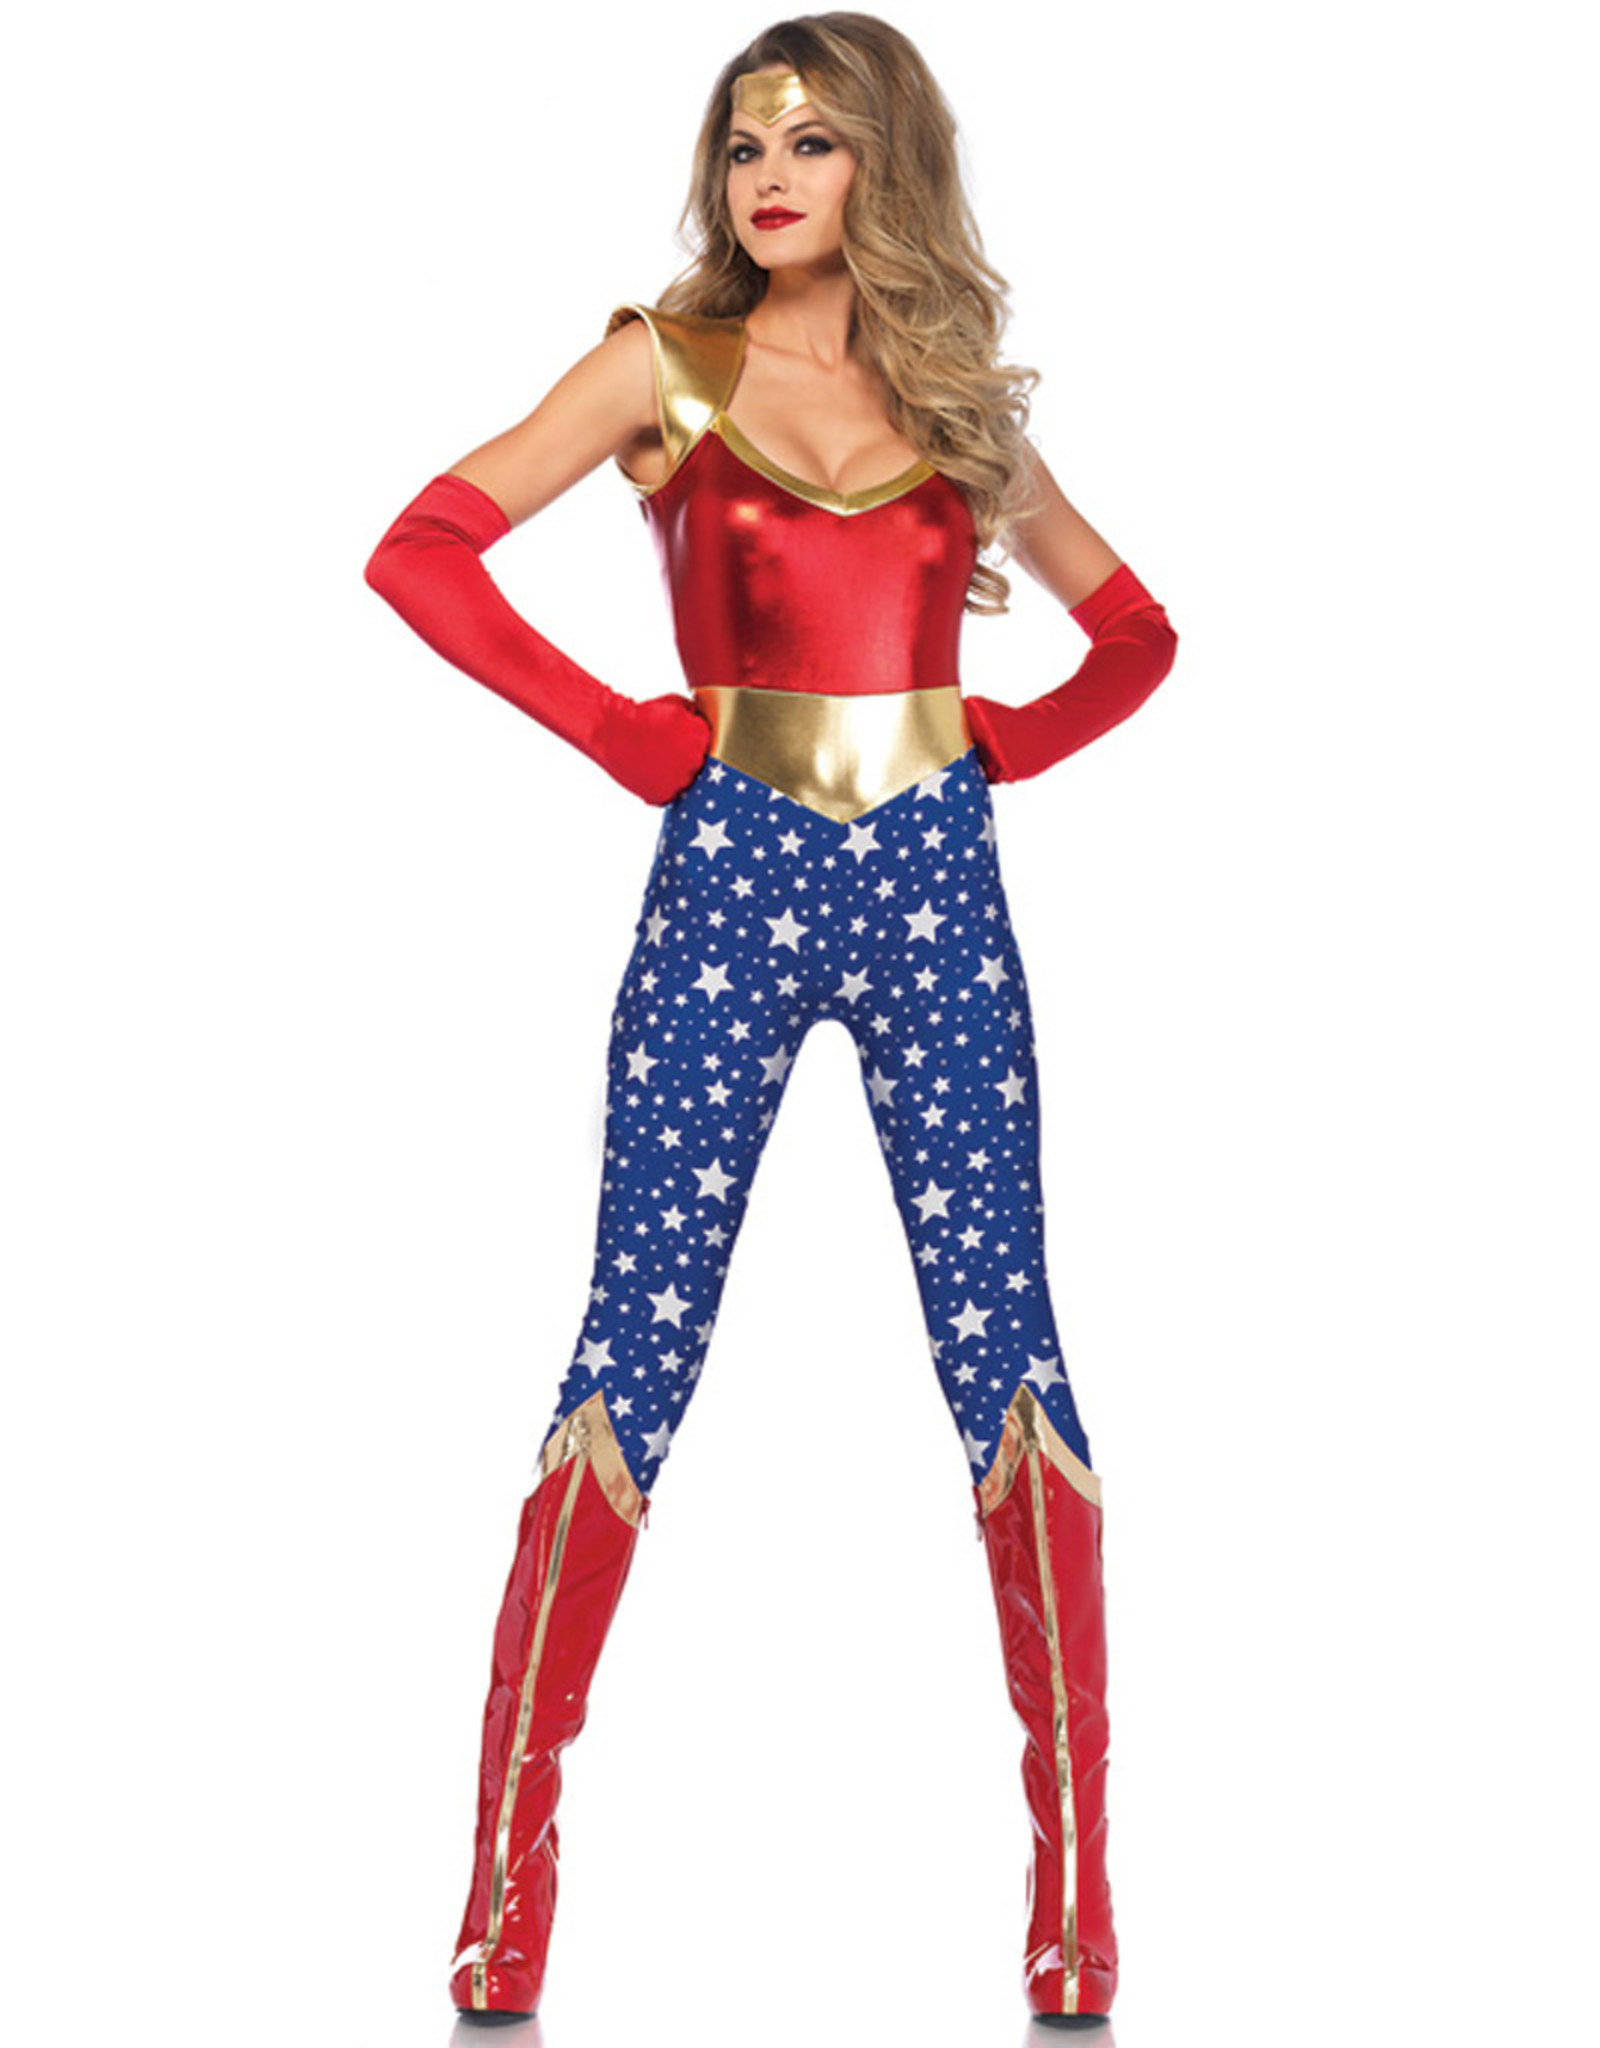 Sensational Superhero Costume - Women's